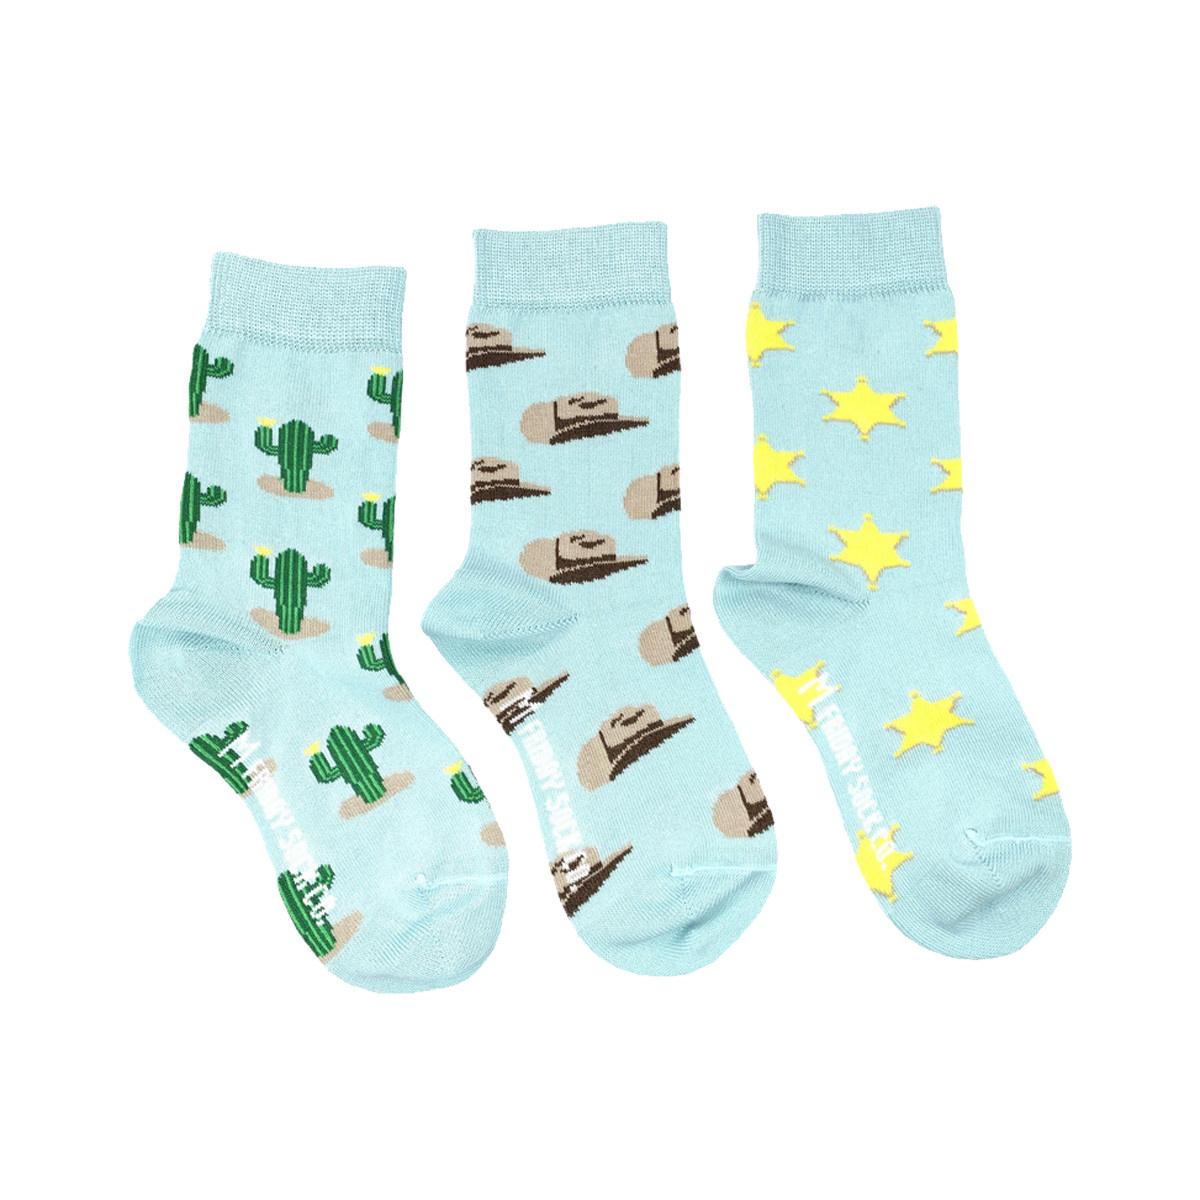 Friday Sock Co. Friday Sock Co. Kids Western Kids